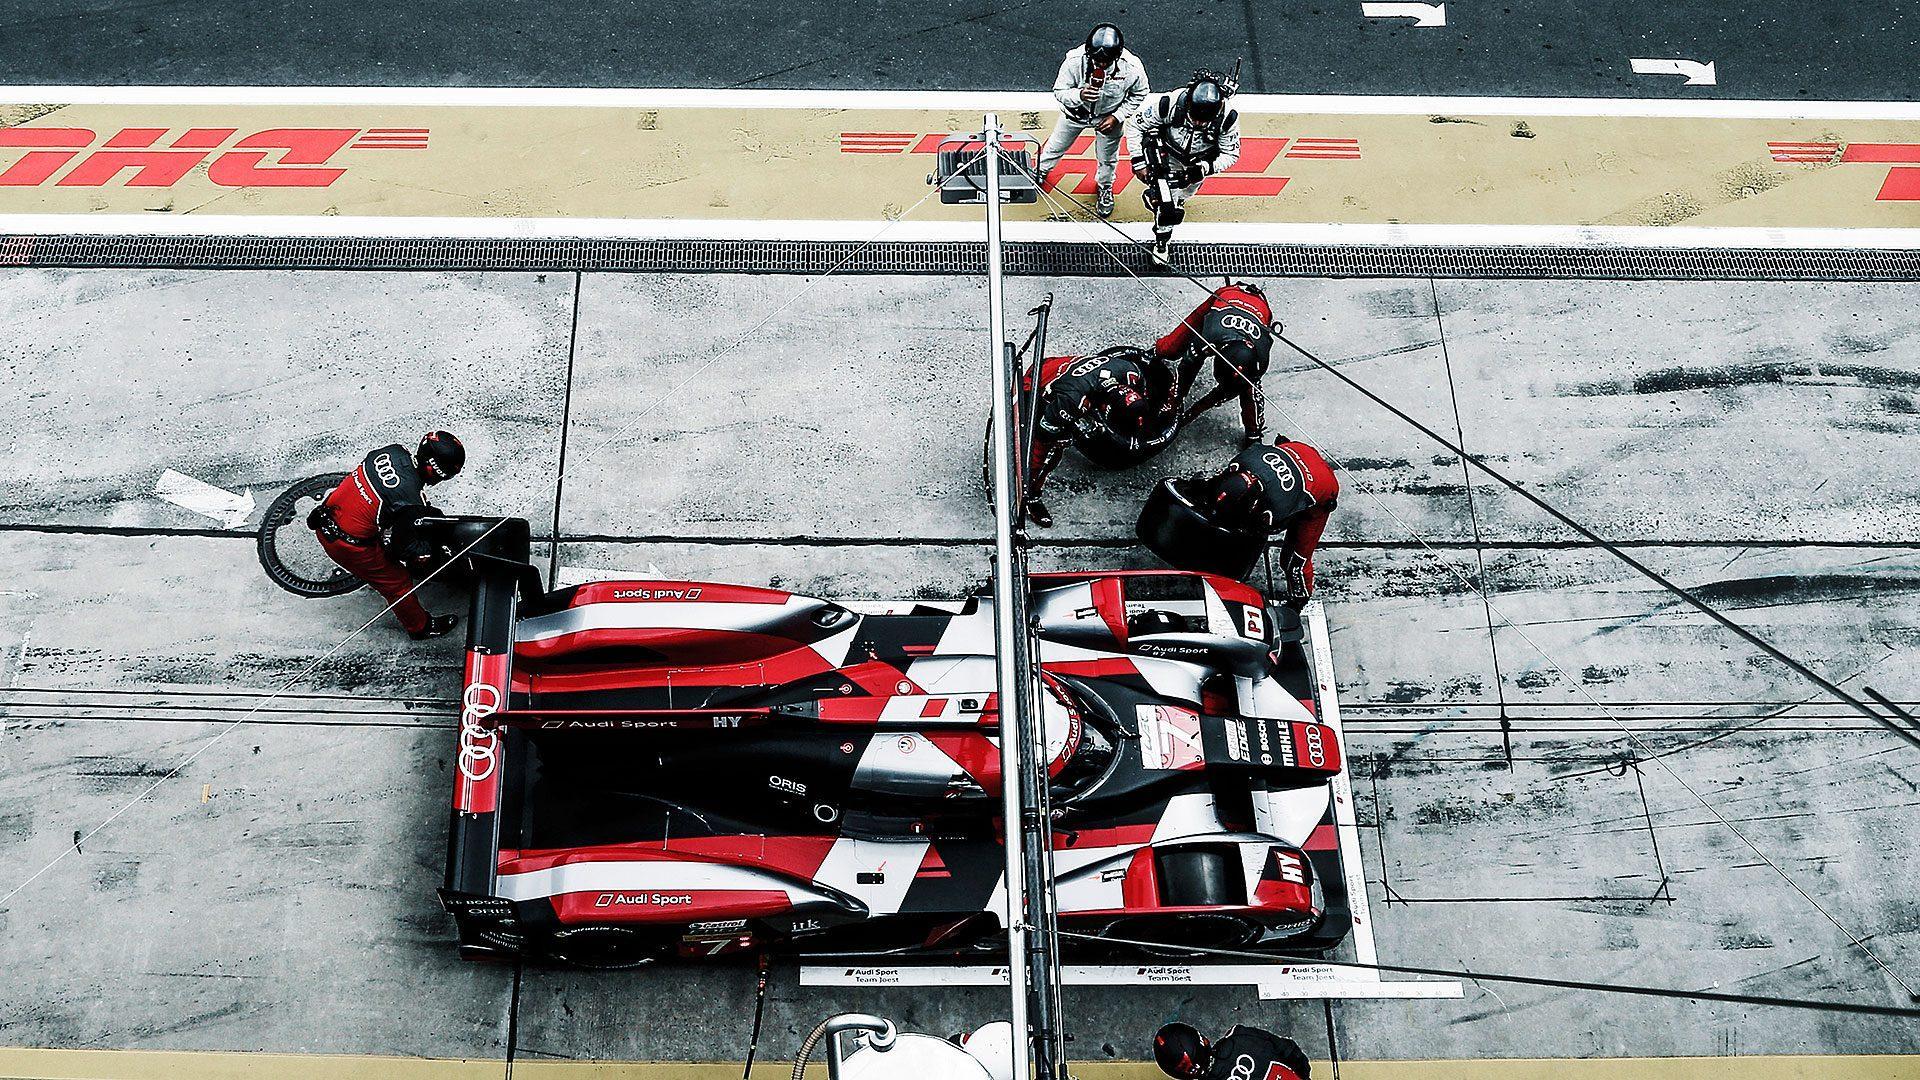 Audi r18 pitstop